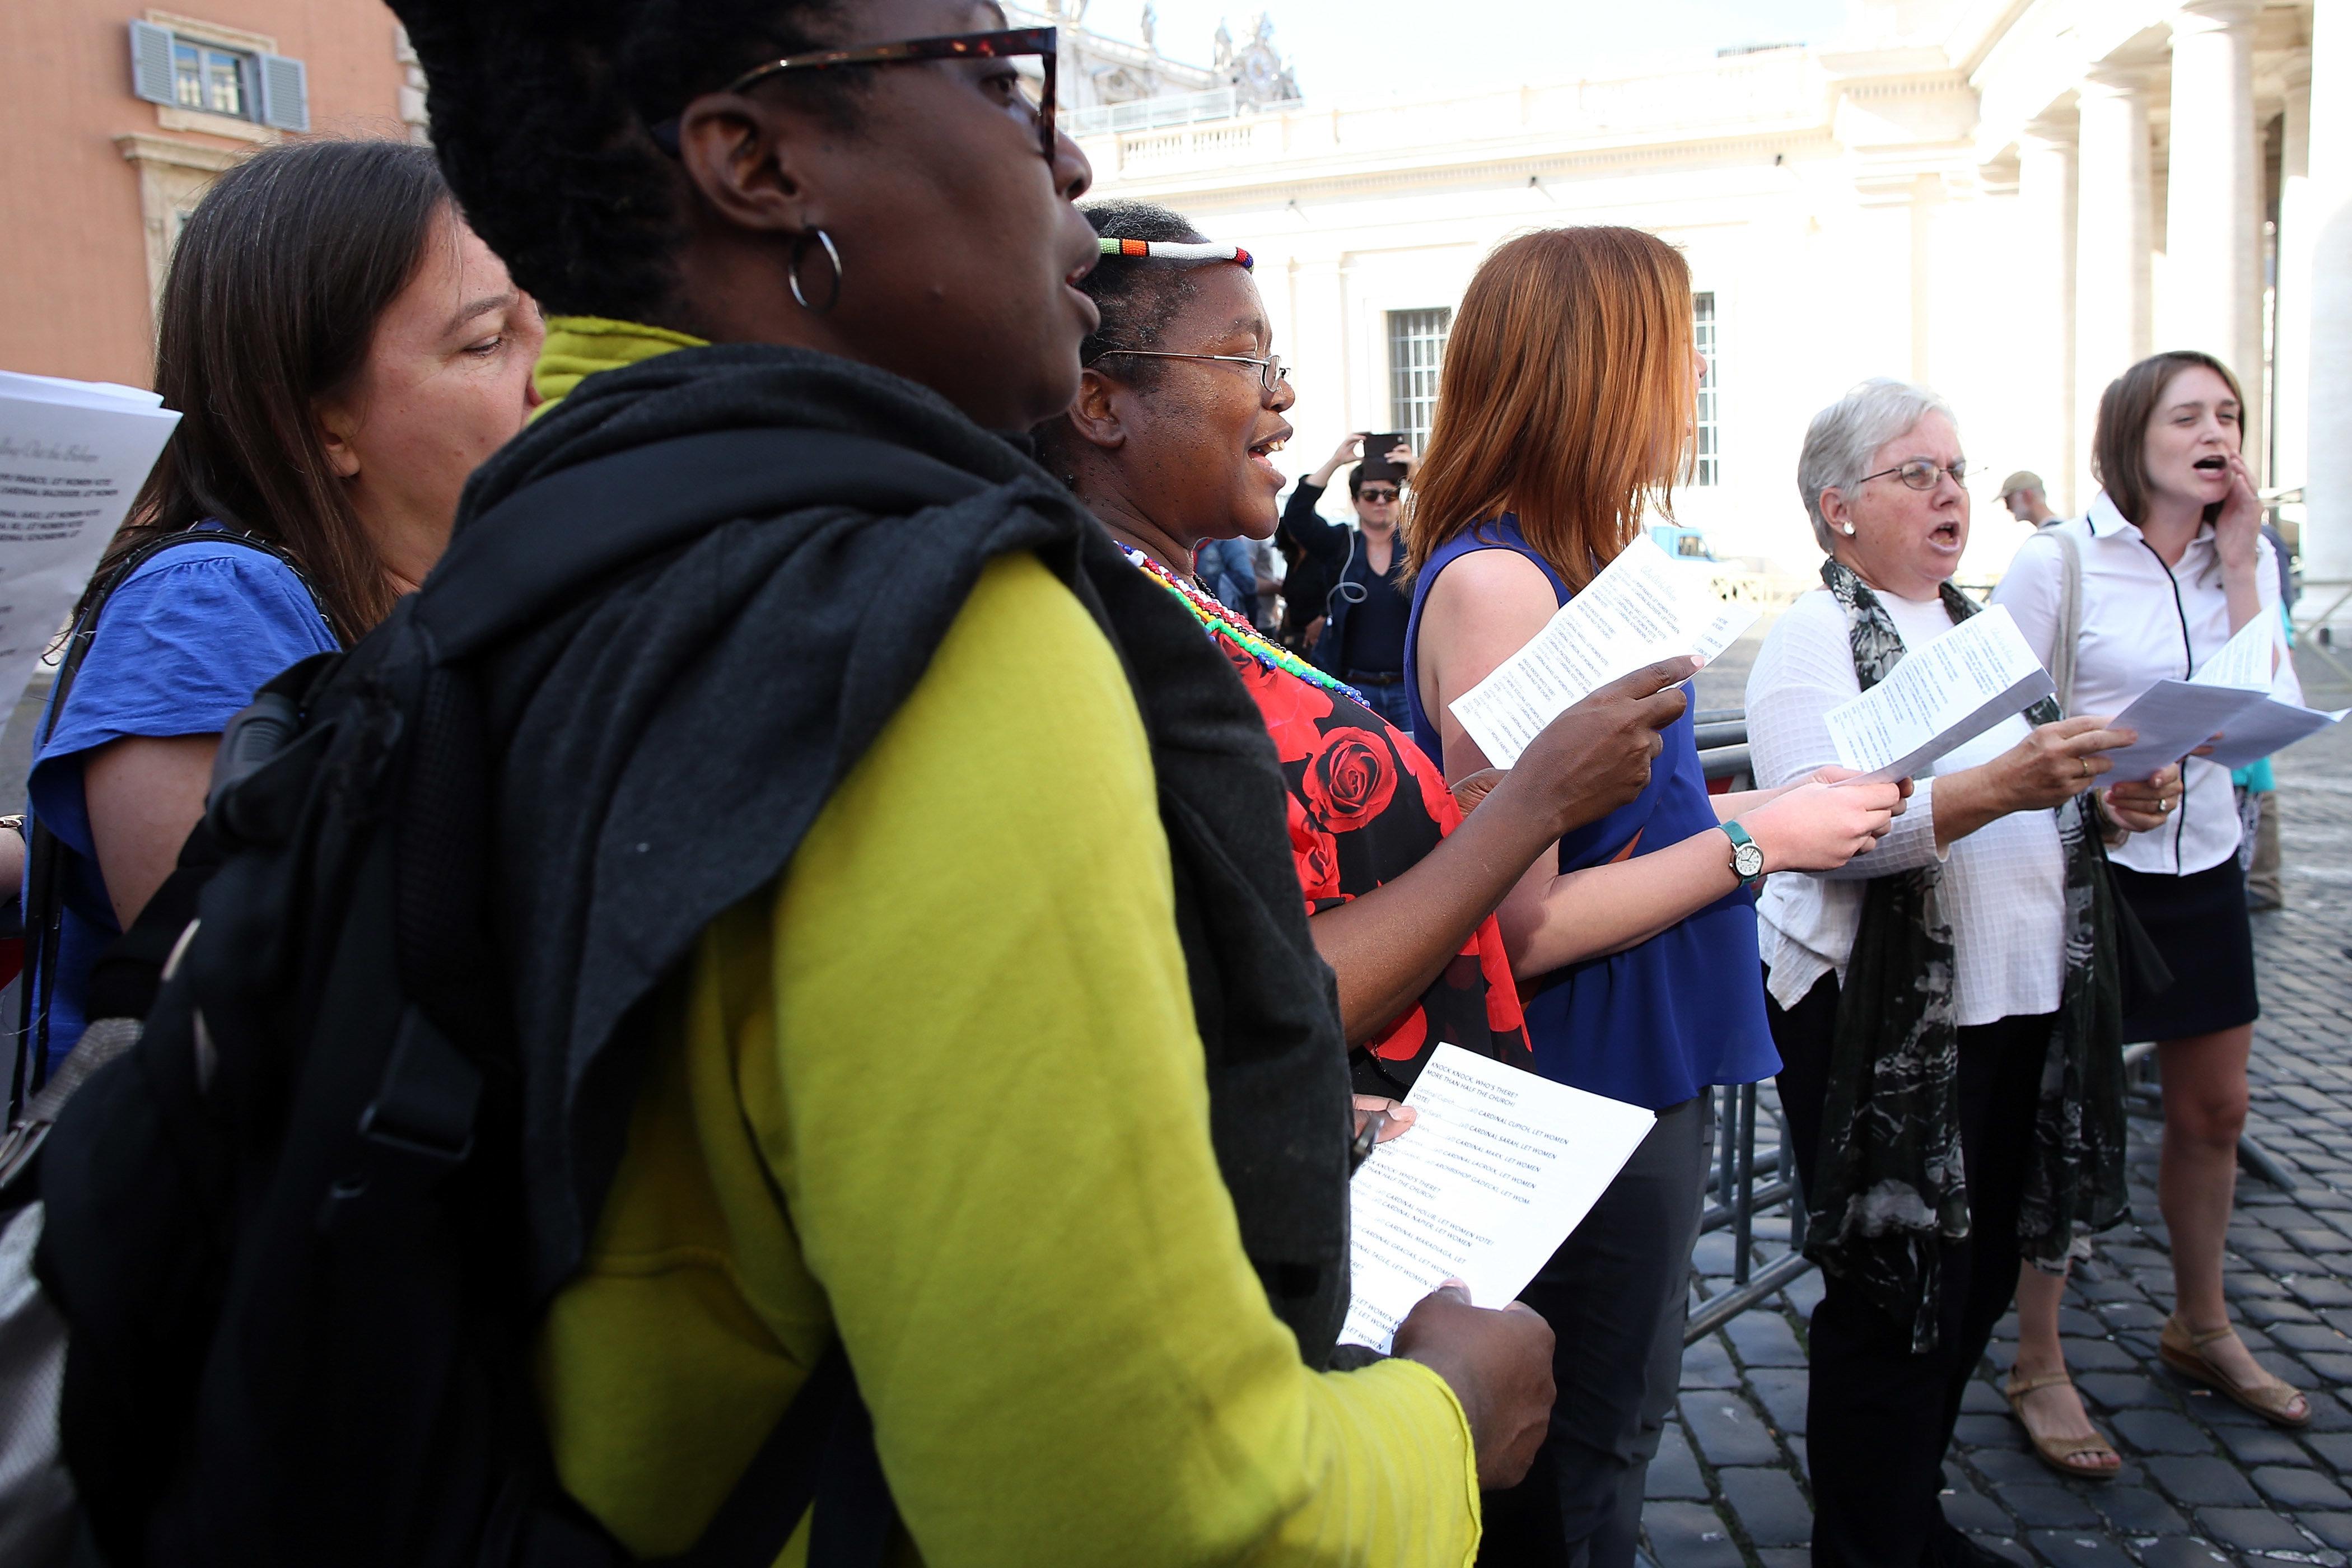 Catholic Activists Demand Women's Voting Rights At Major Vatican